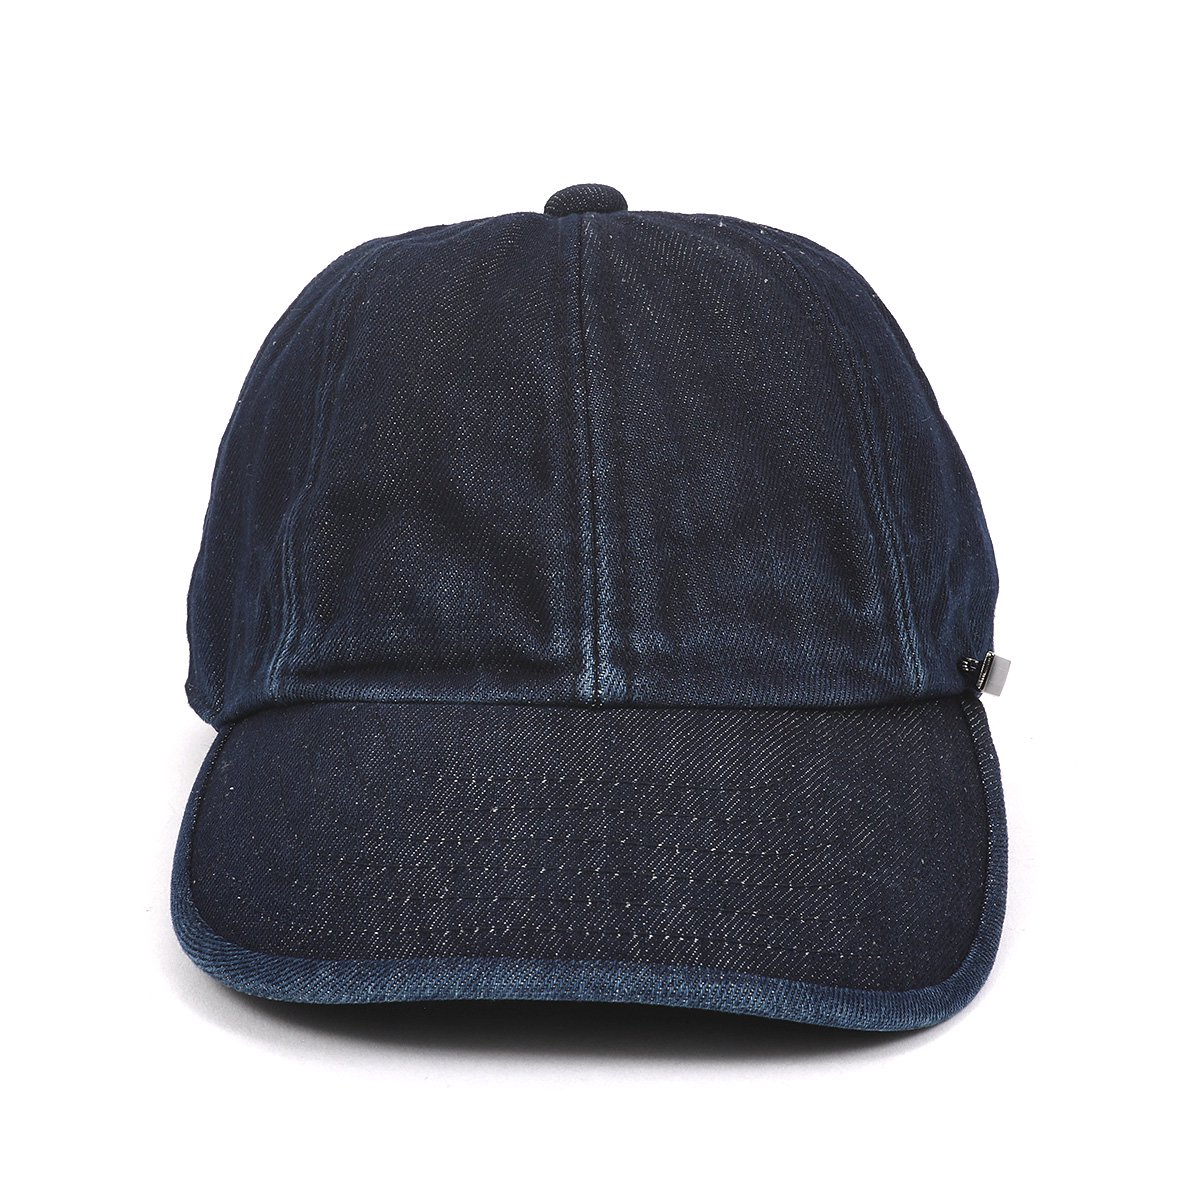 INDIGO 8PANEL CAP 詳細画像3